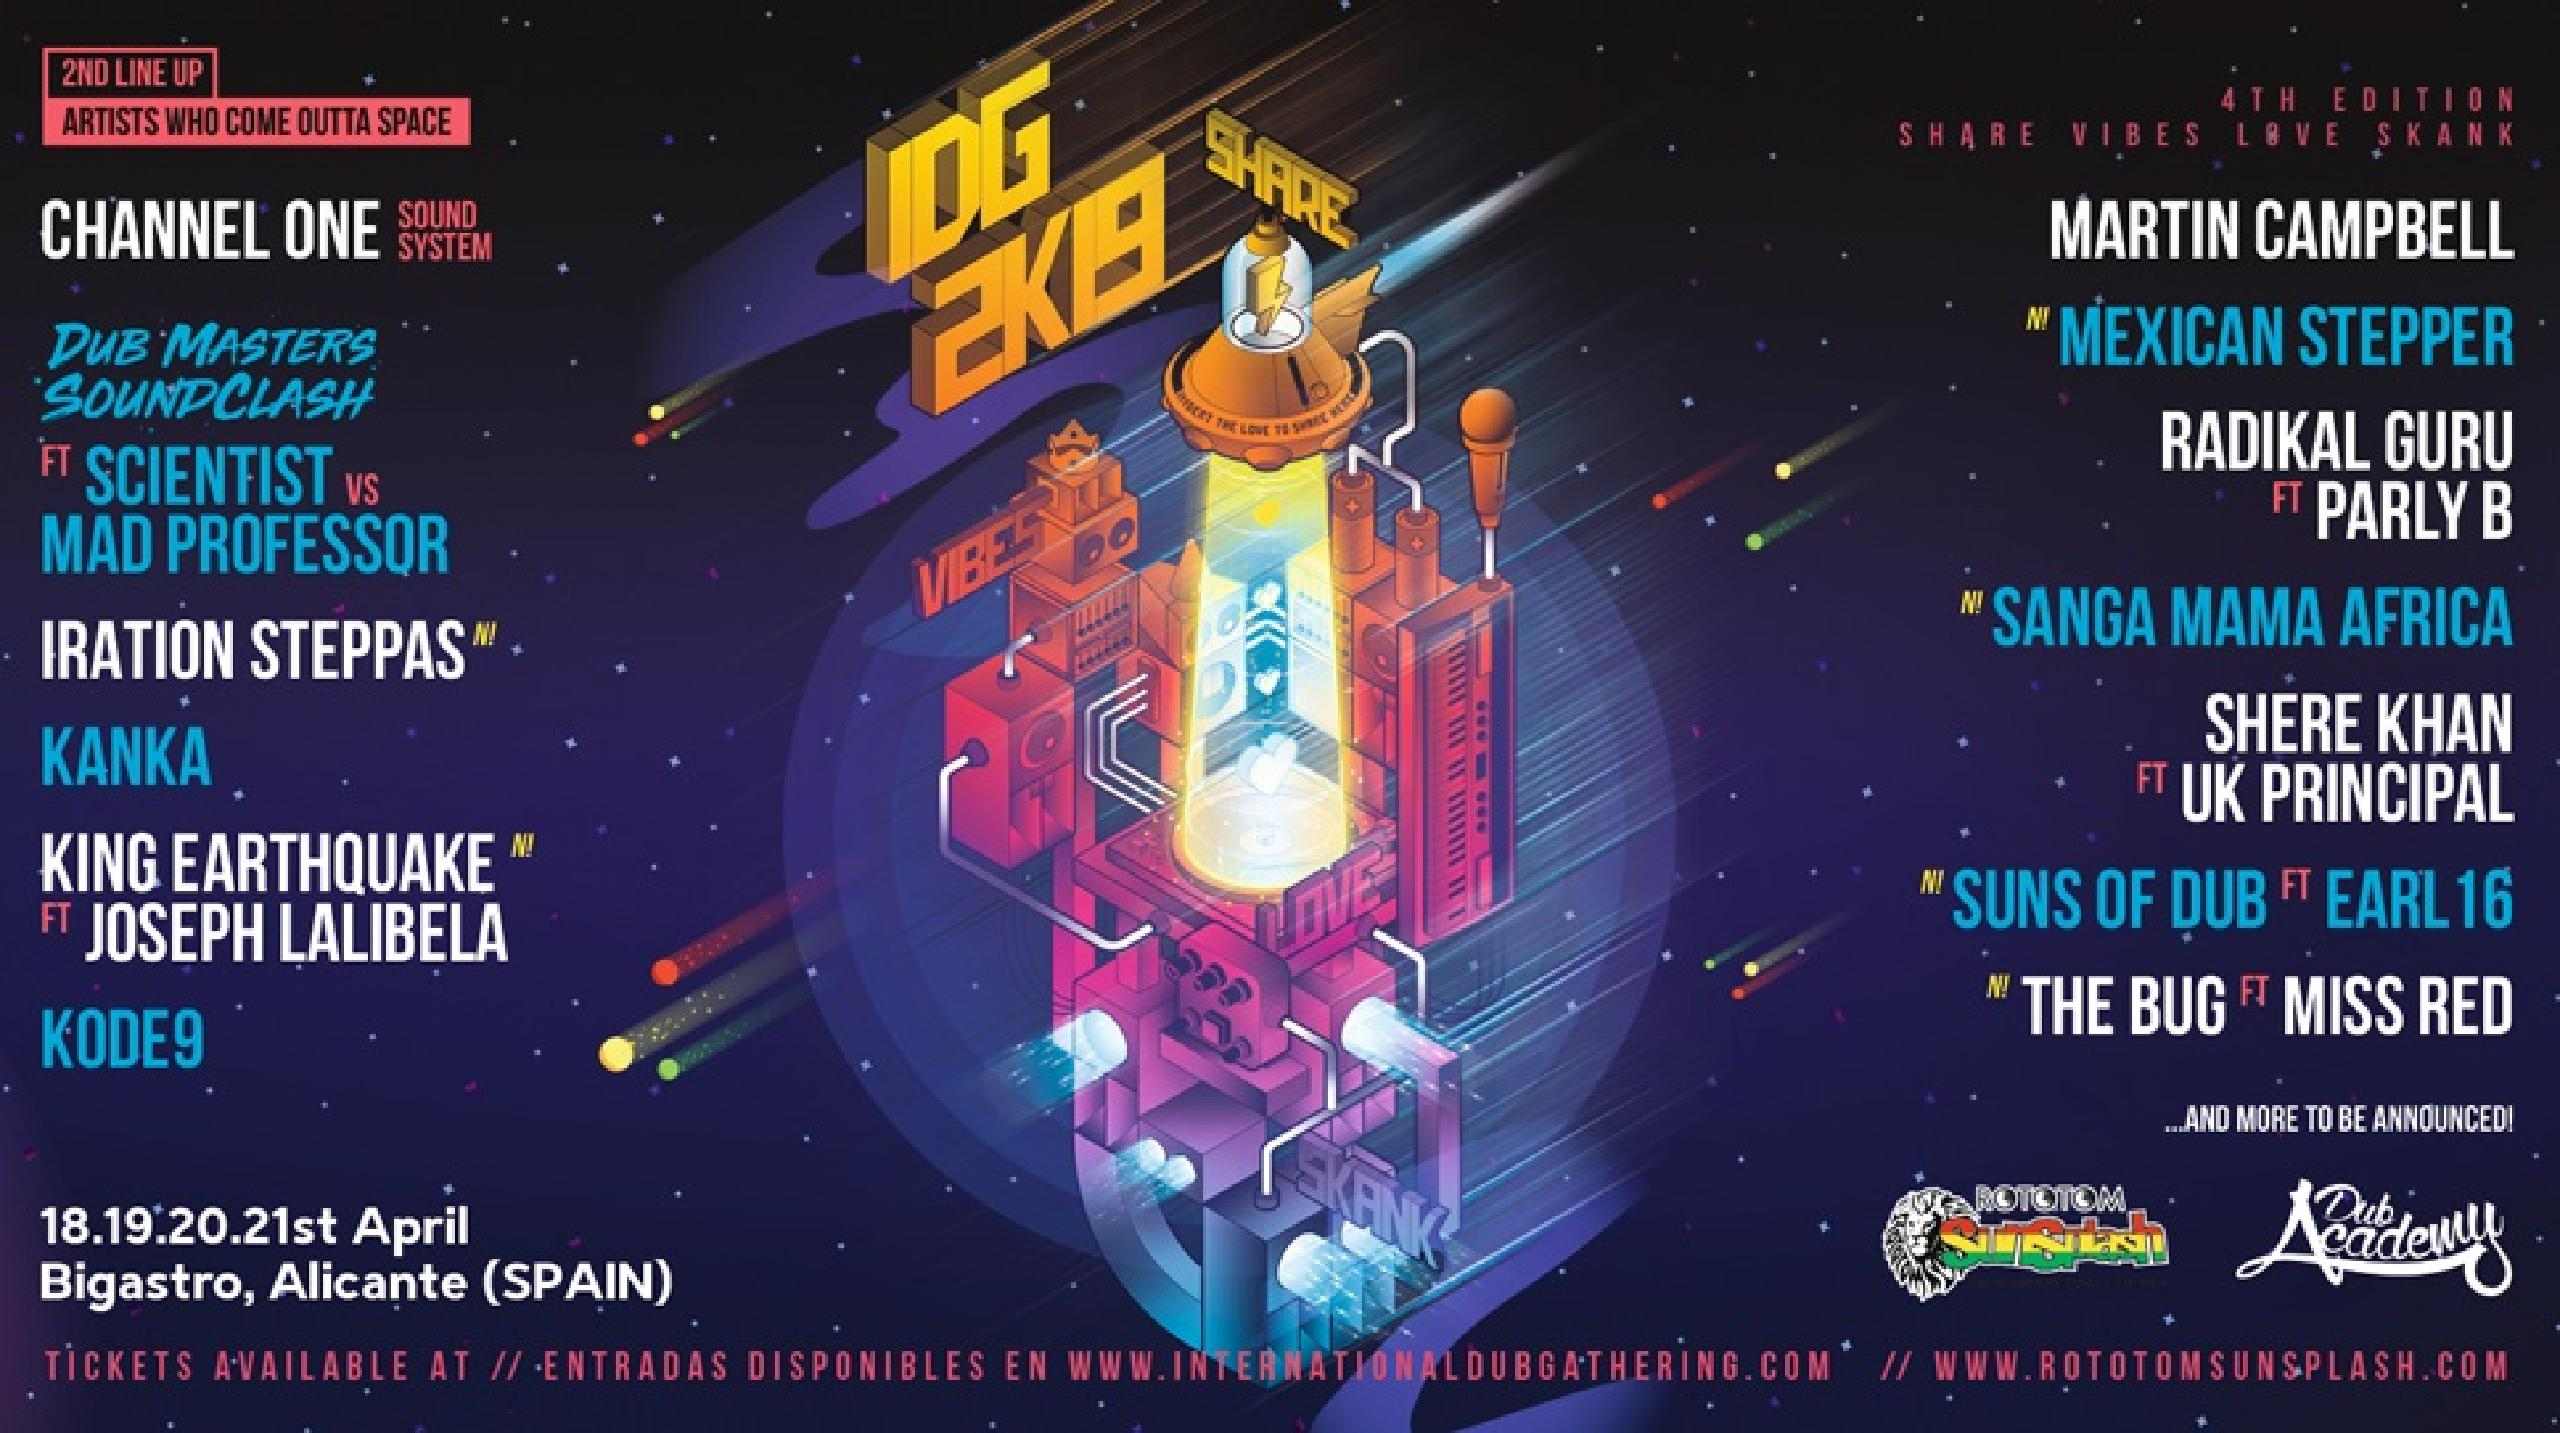 Line-up International Dub Gathering 2019